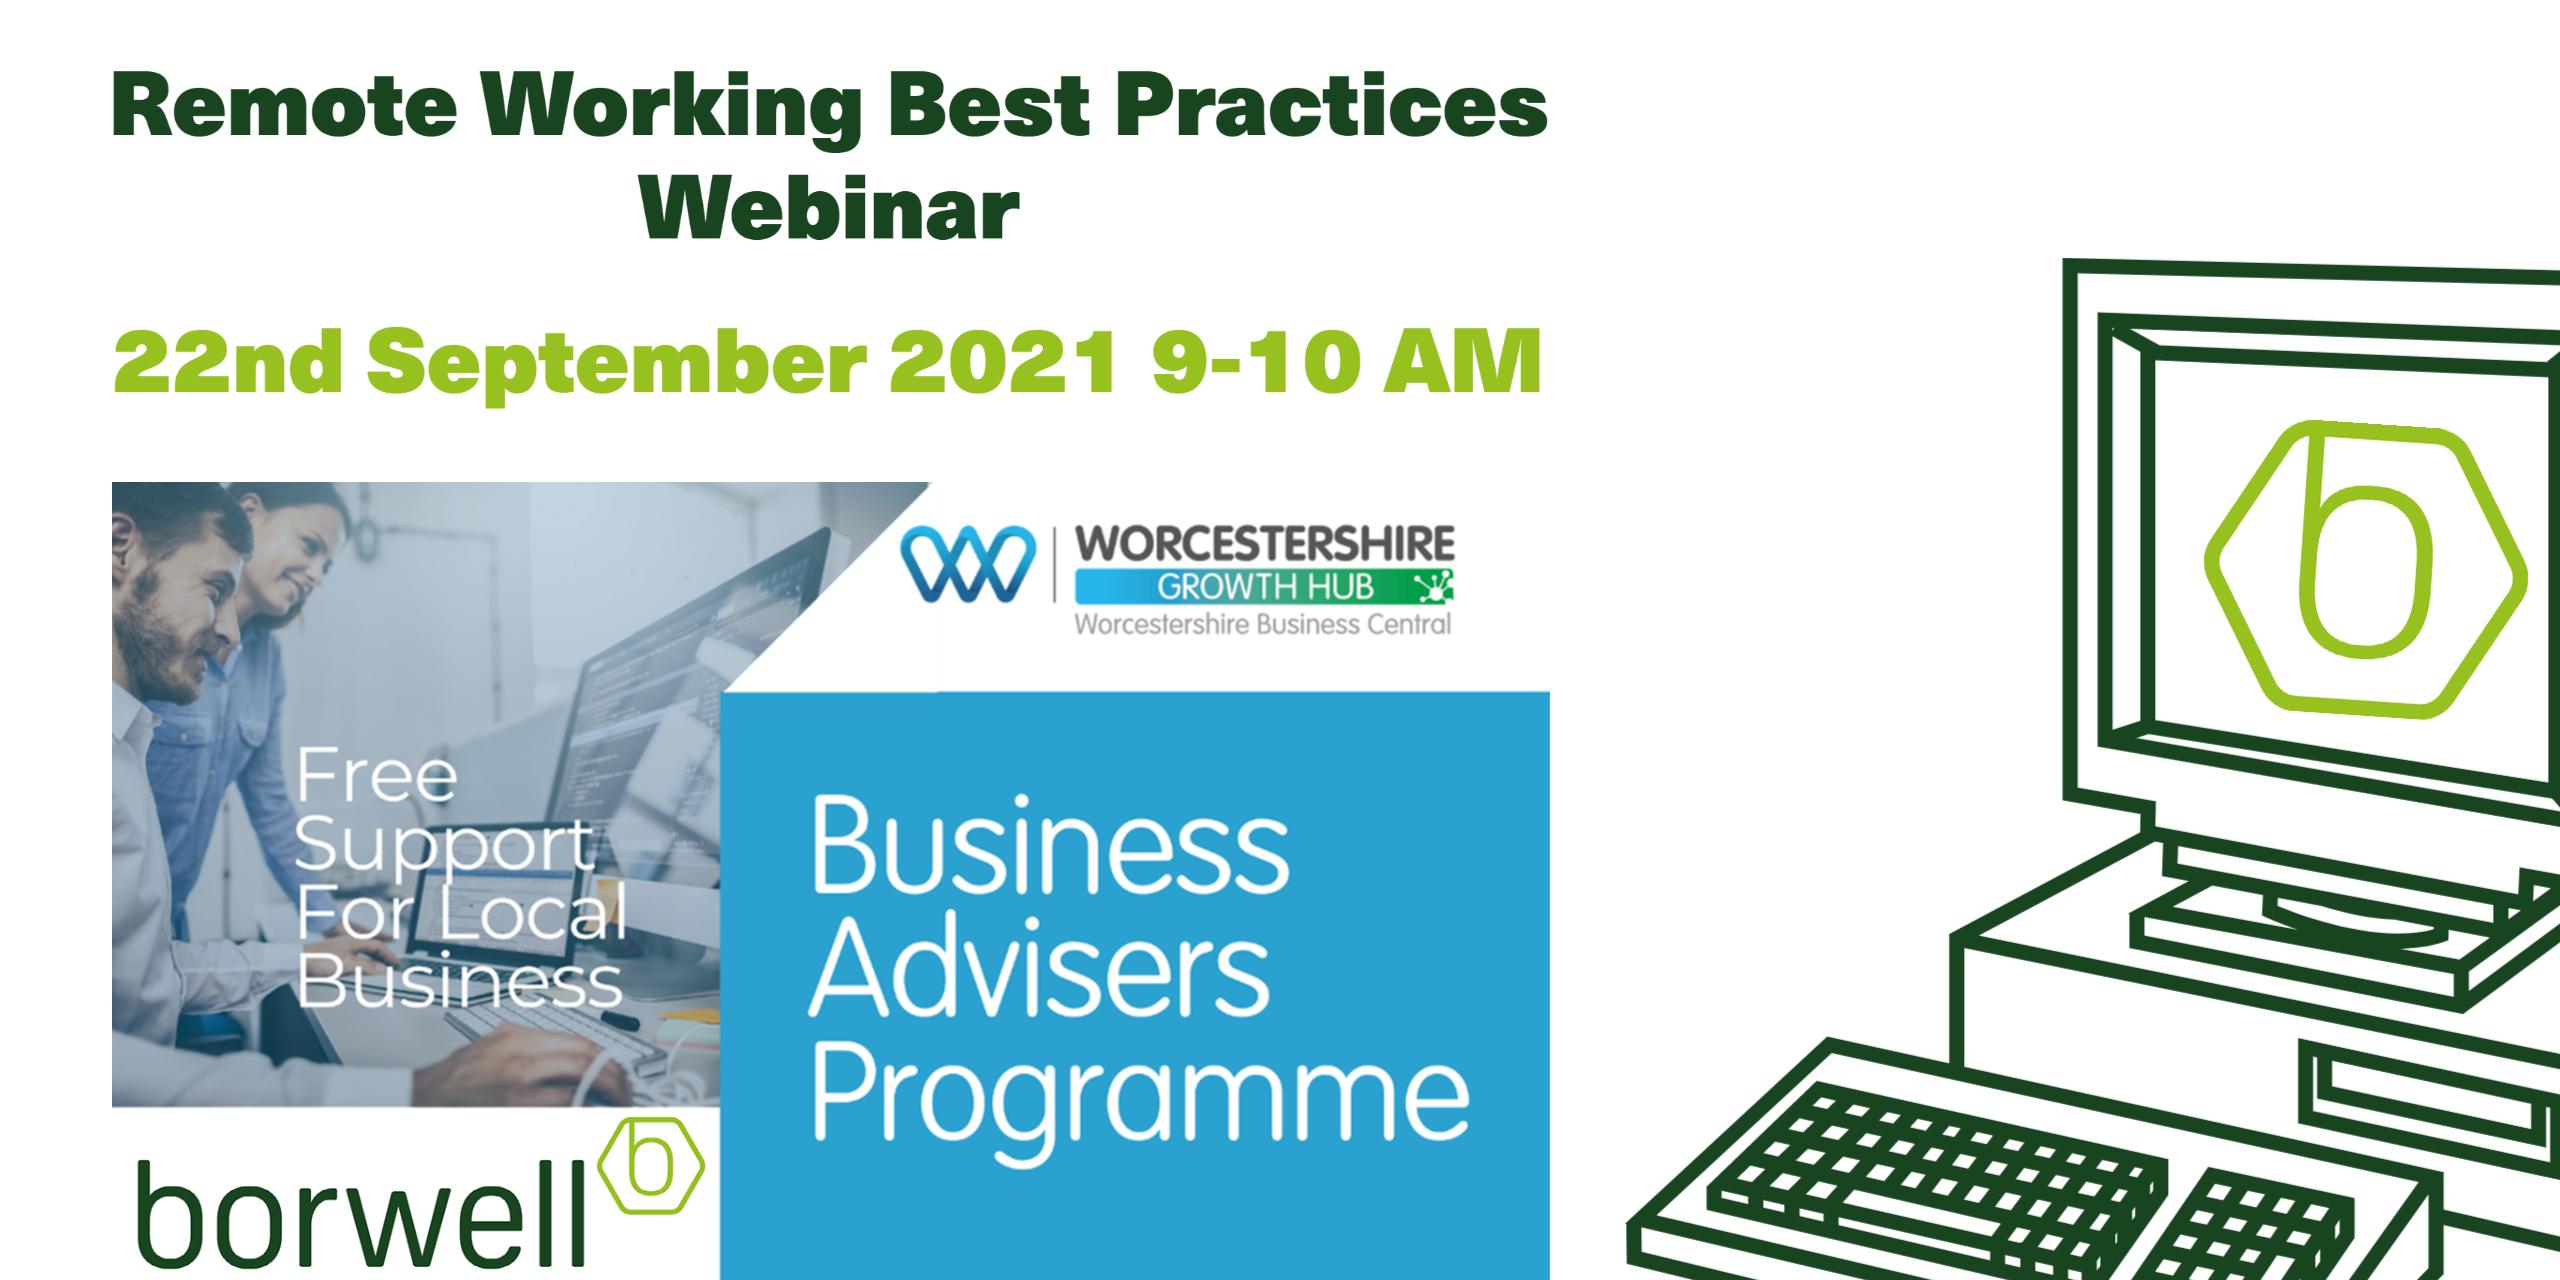 Business Adviser Programme - Remote Working Best Practices Webinar